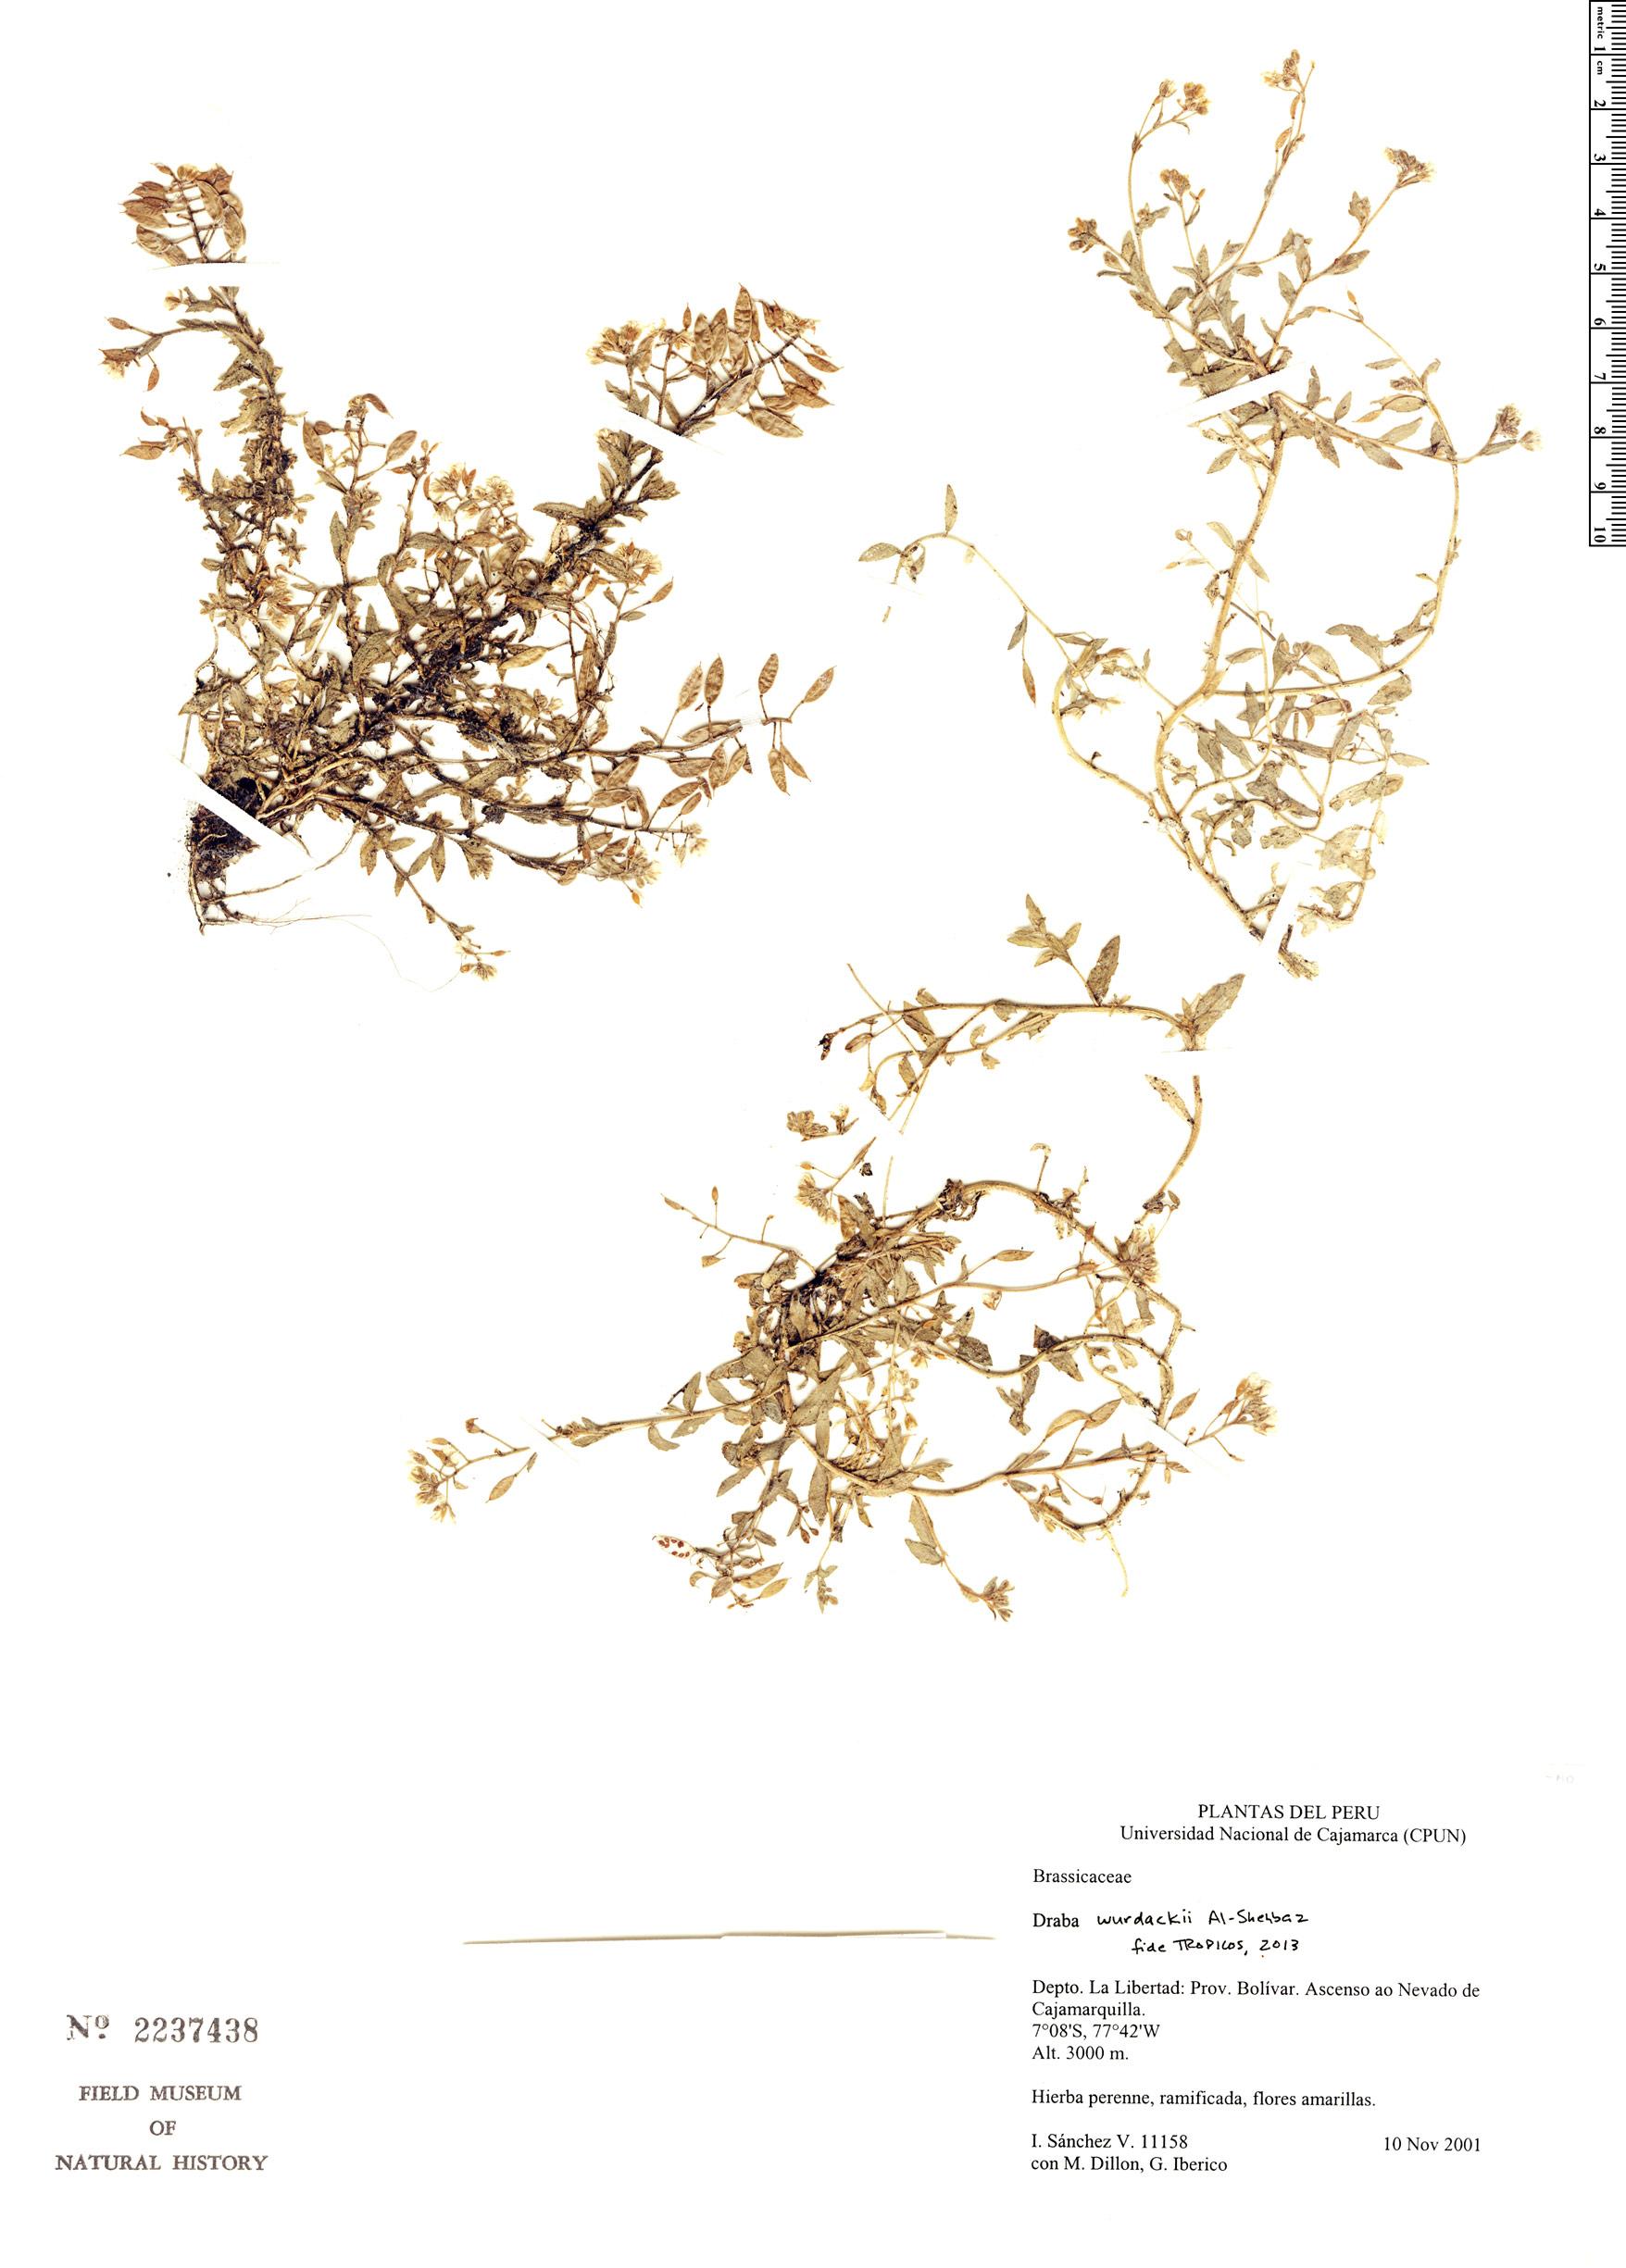 Specimen: Draba wurdackii